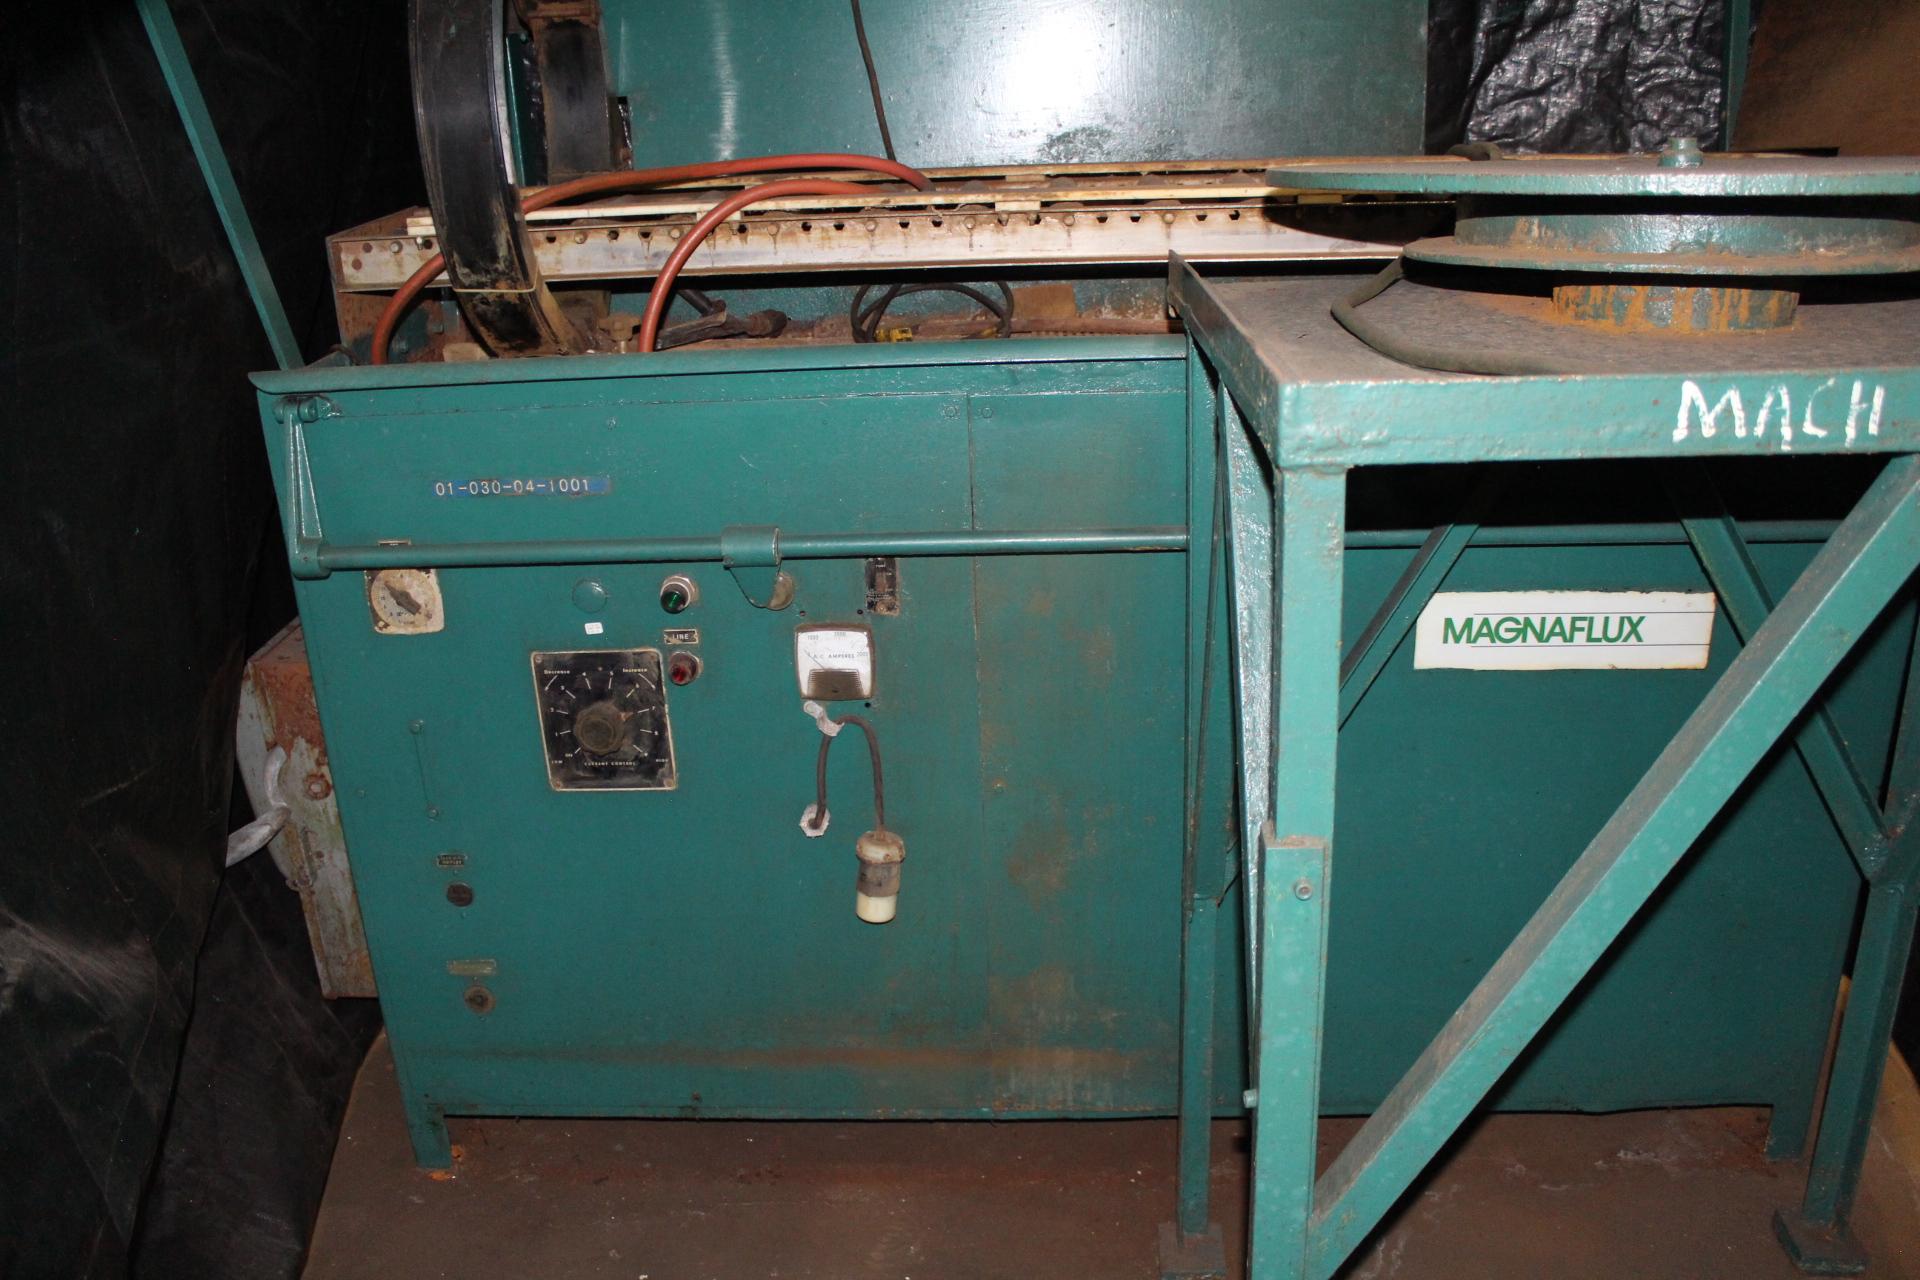 Lot 39 - Magnaflux Type GS-54H Magnetic Particle Inspection Machine